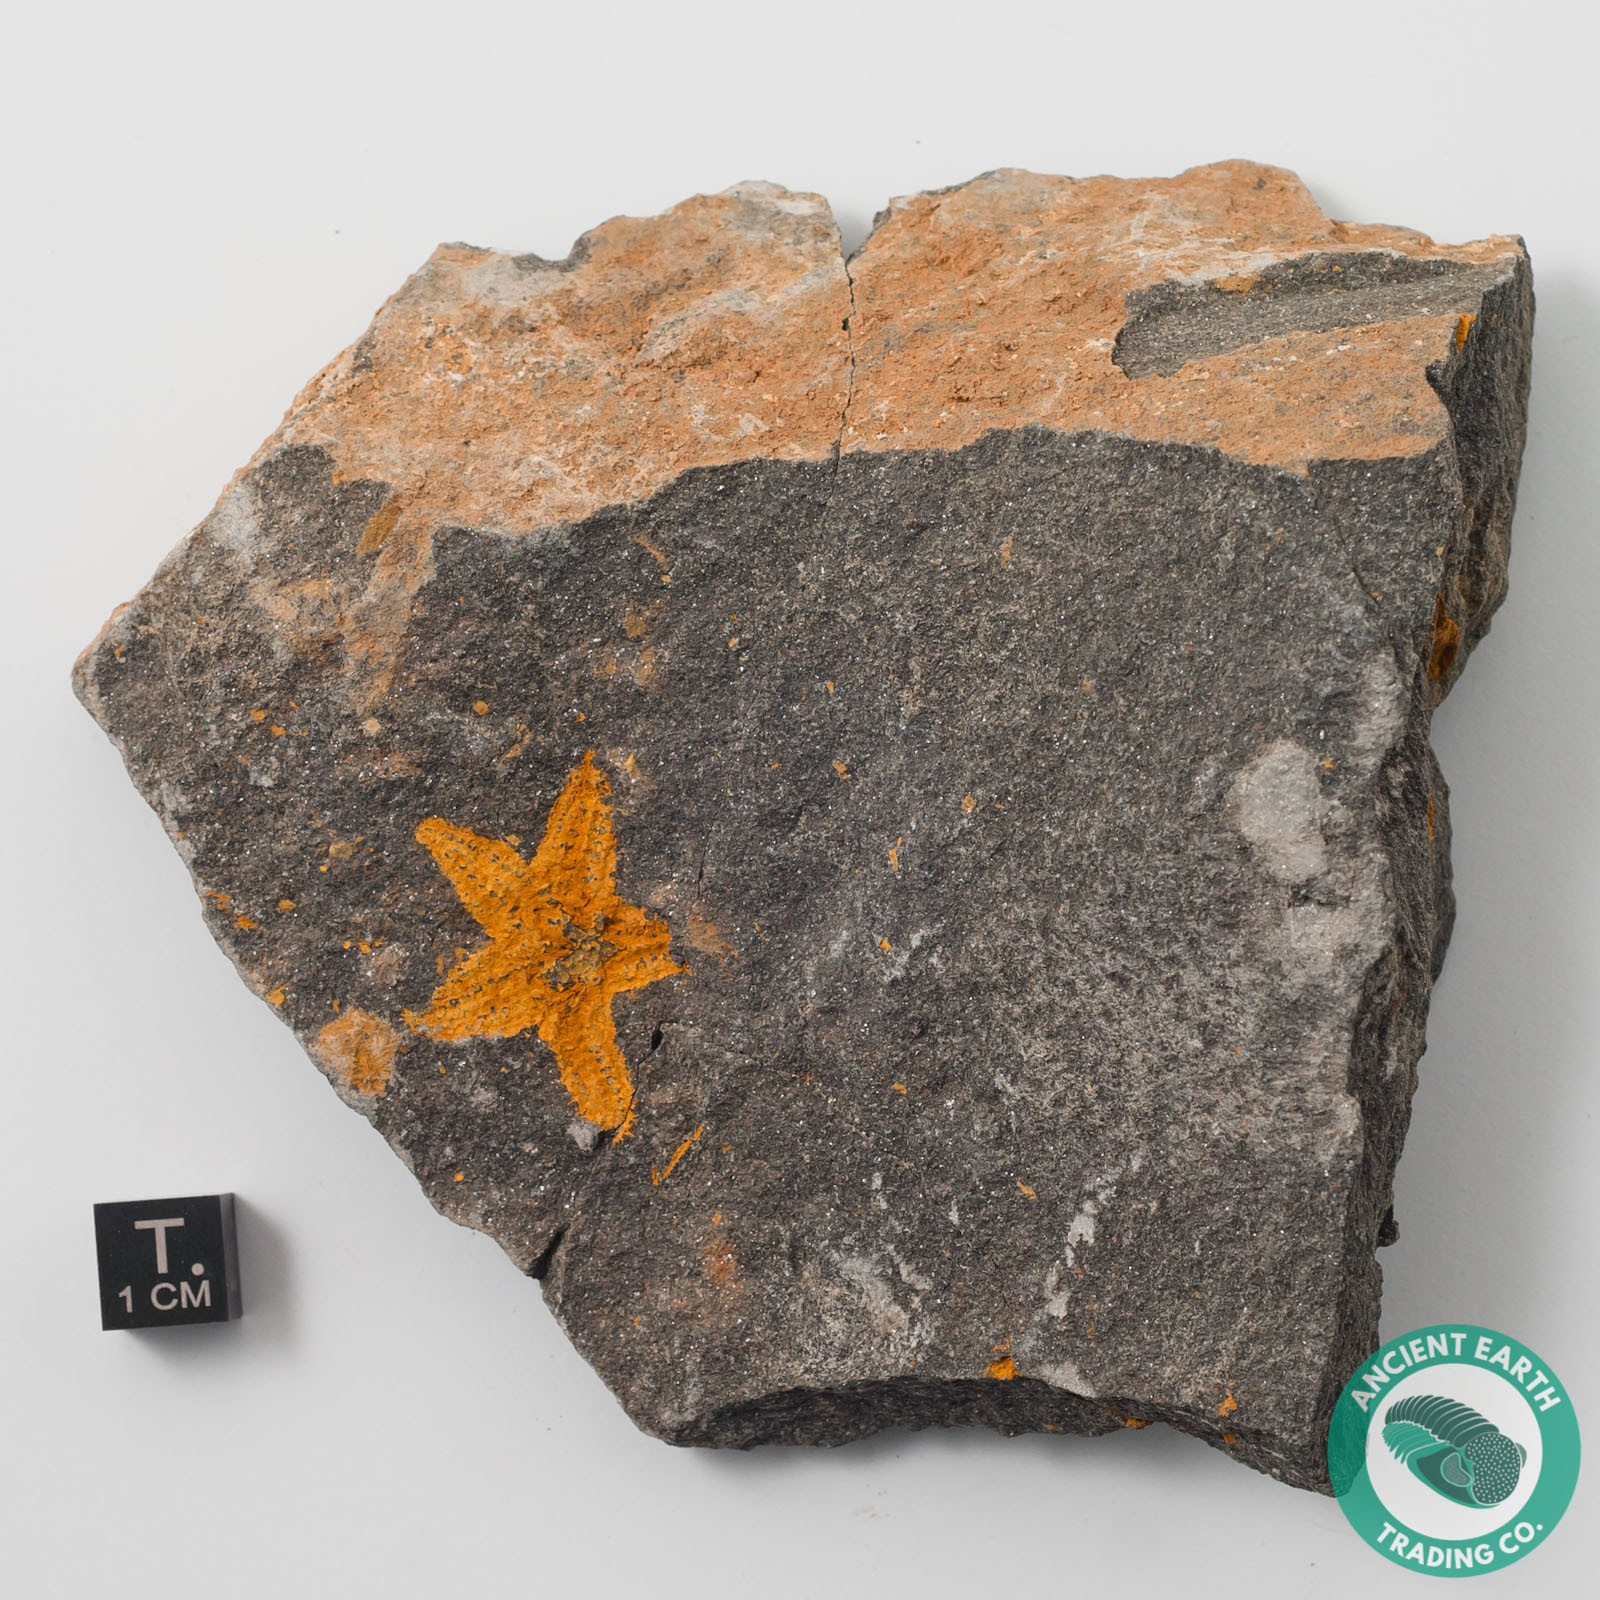 1.21 in. Starfish Fossil Stenaster - Morocco - Starfish ...